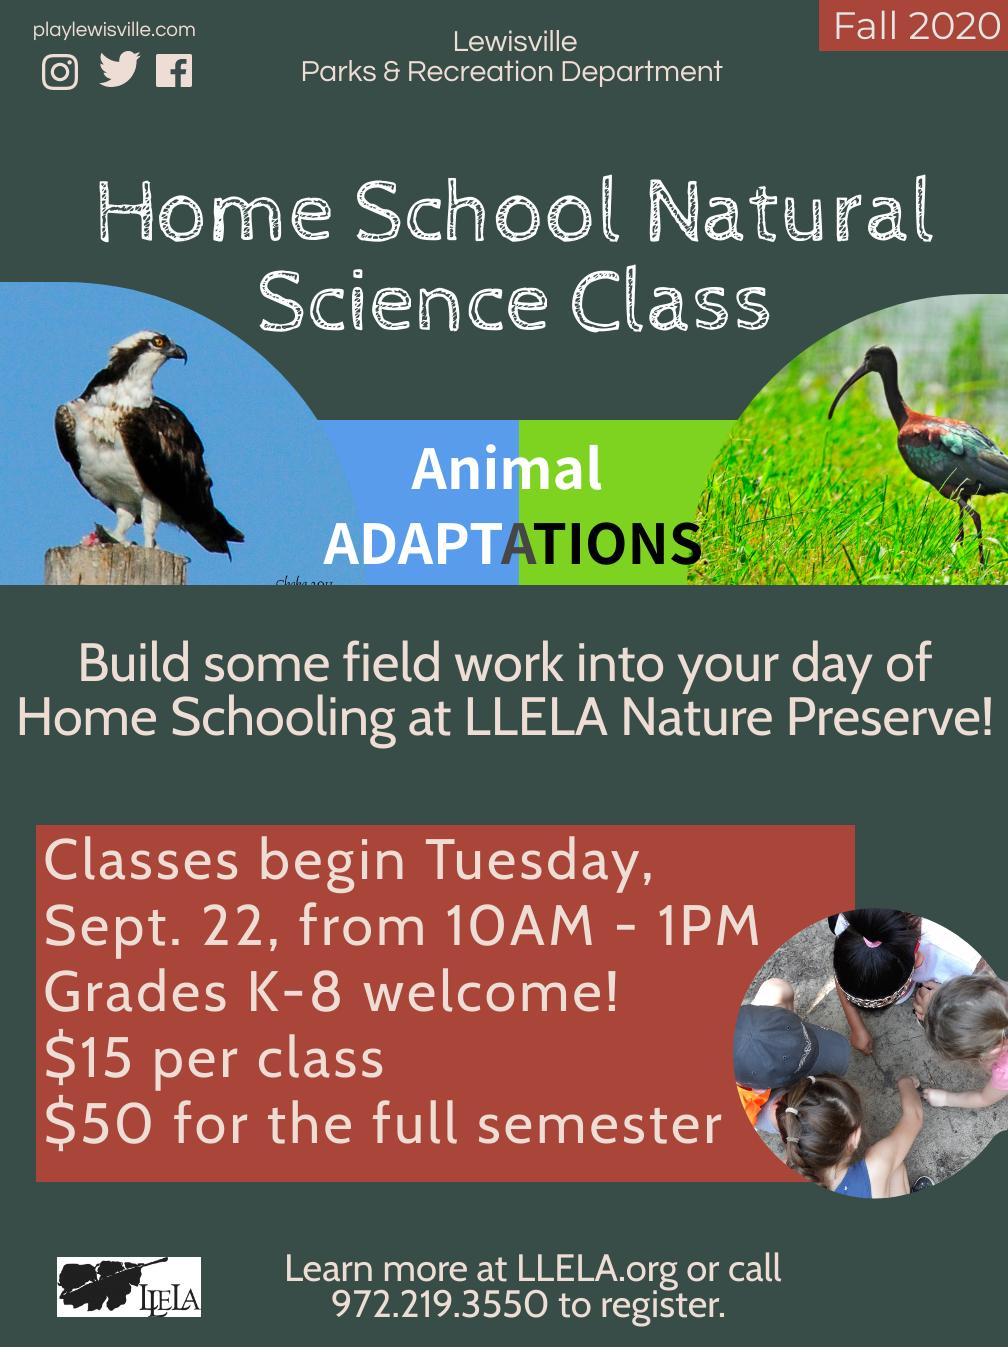 LLELA Home School Natural Science